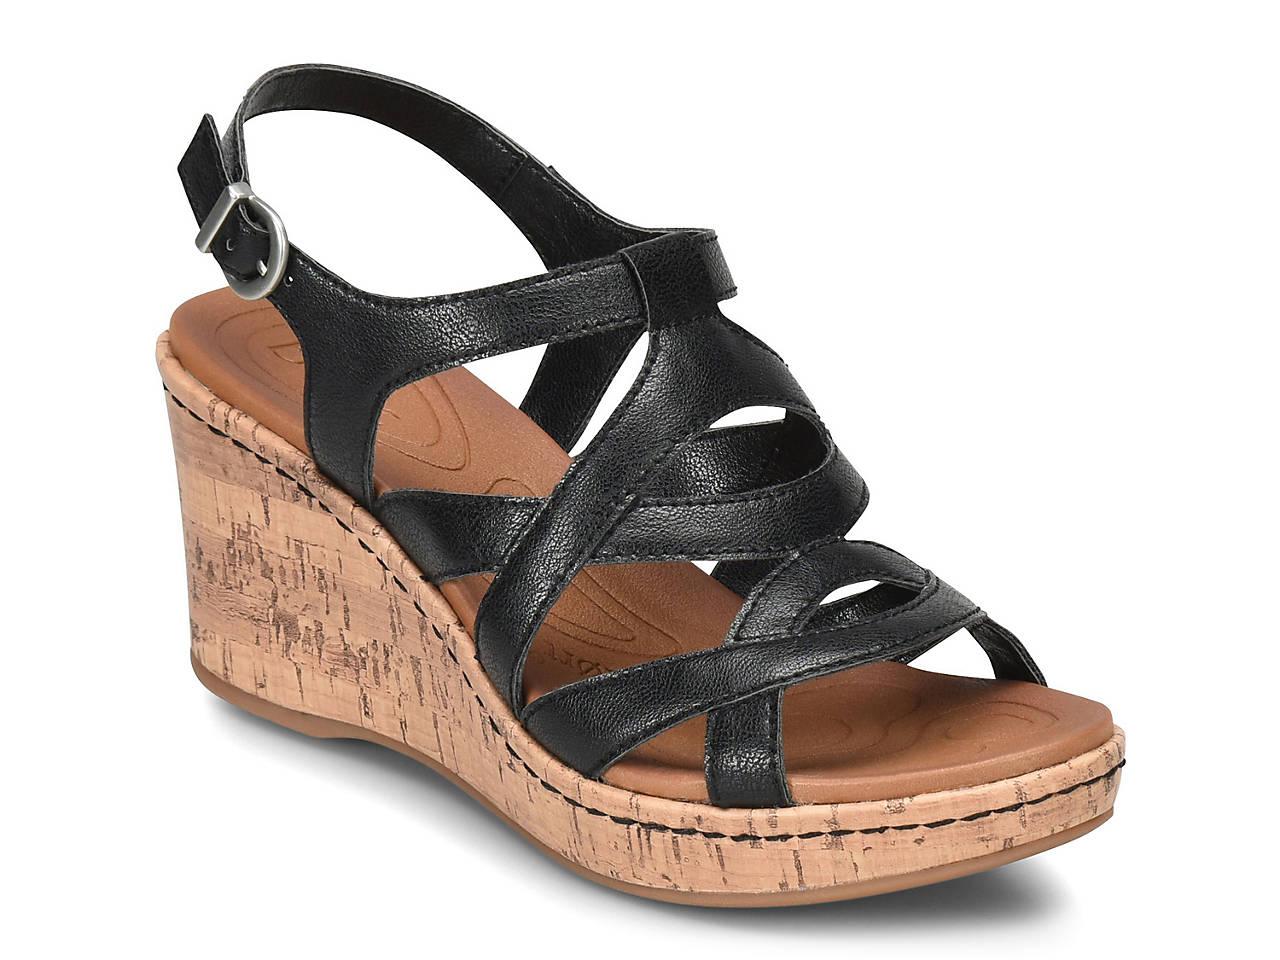 e6c505e7518 b.o.c Chyna II Wedge Sandal Women s Shoes